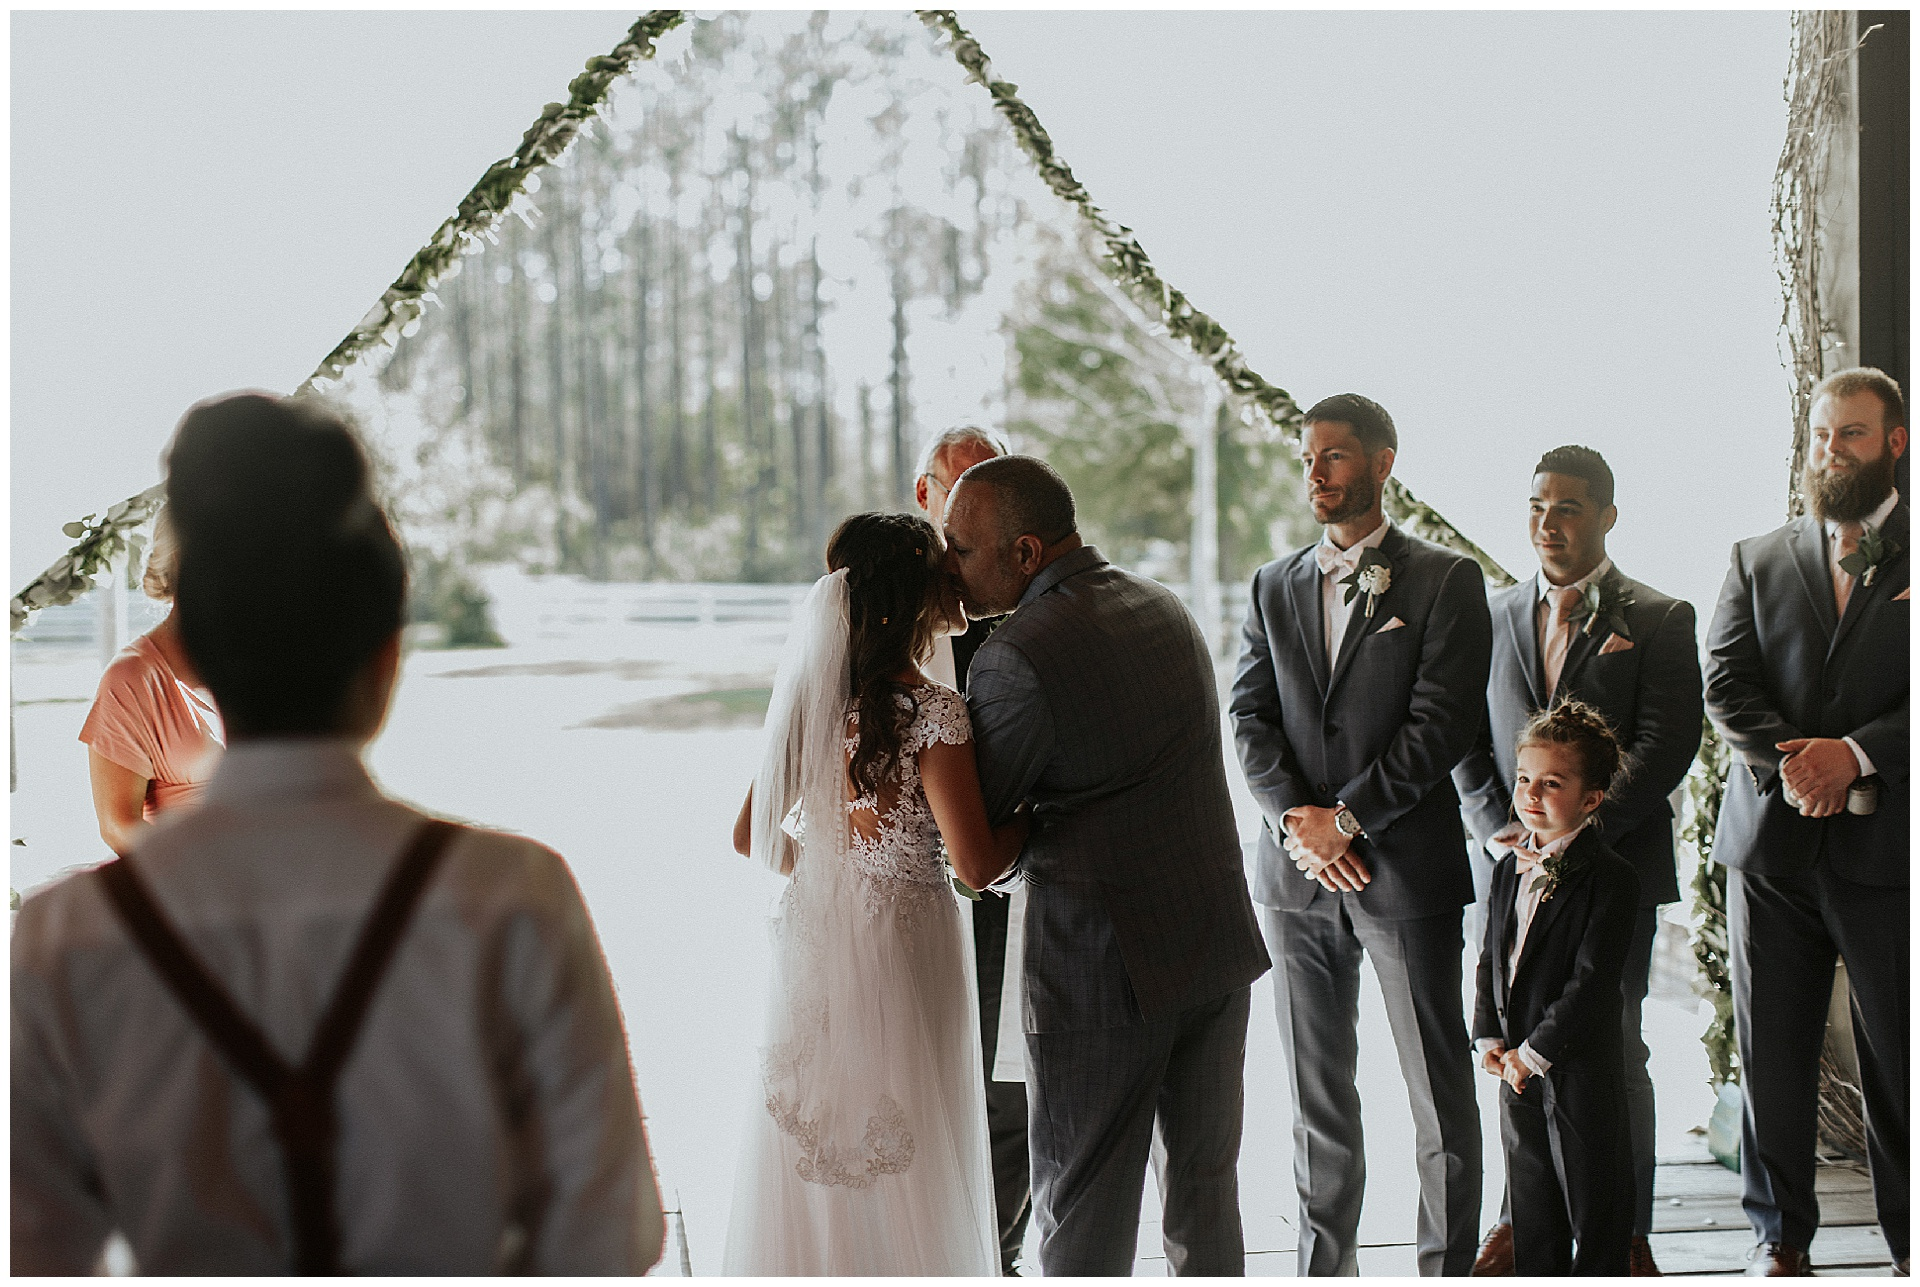 st augustine wedding photographer_mia dimare photography16.jpg